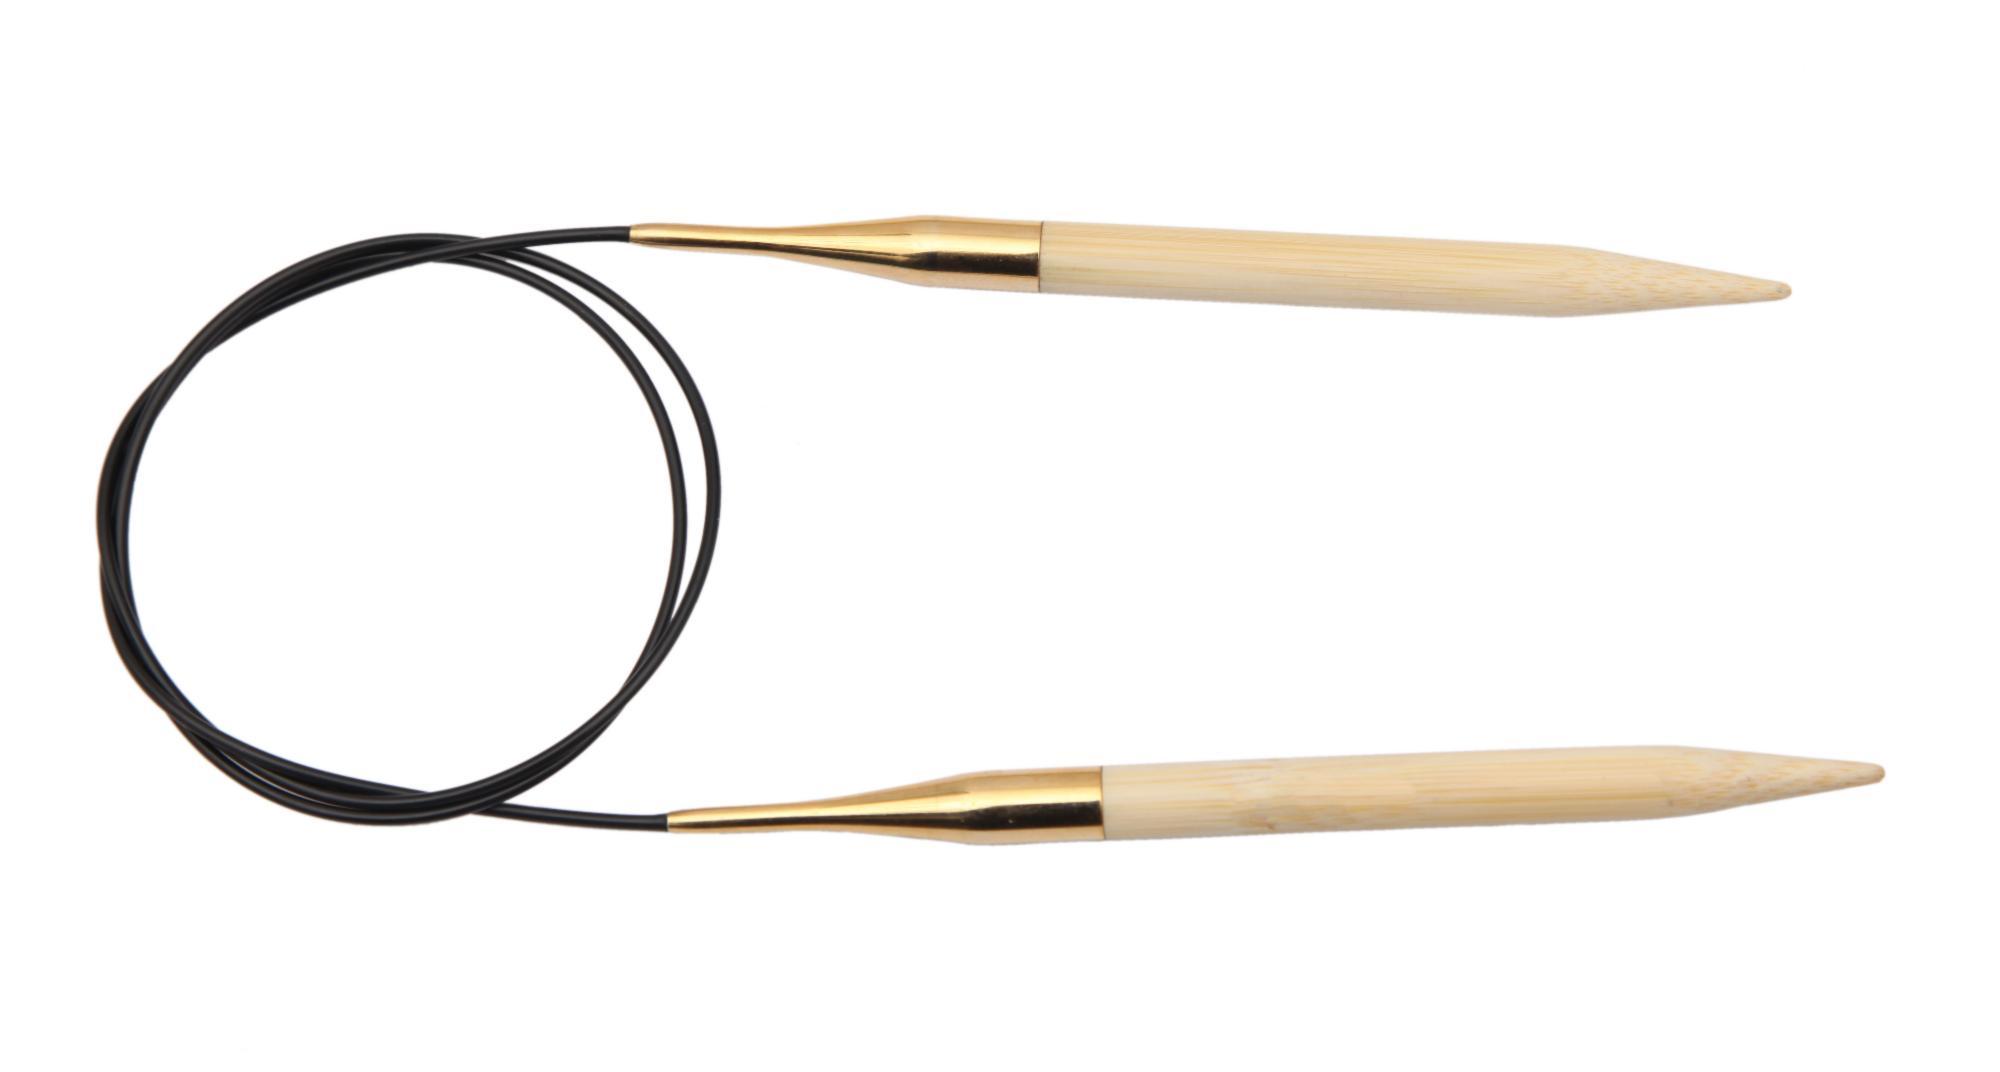 Спицы круговые 40 см Bamboo KnitPro, 22206, 3.50 мм